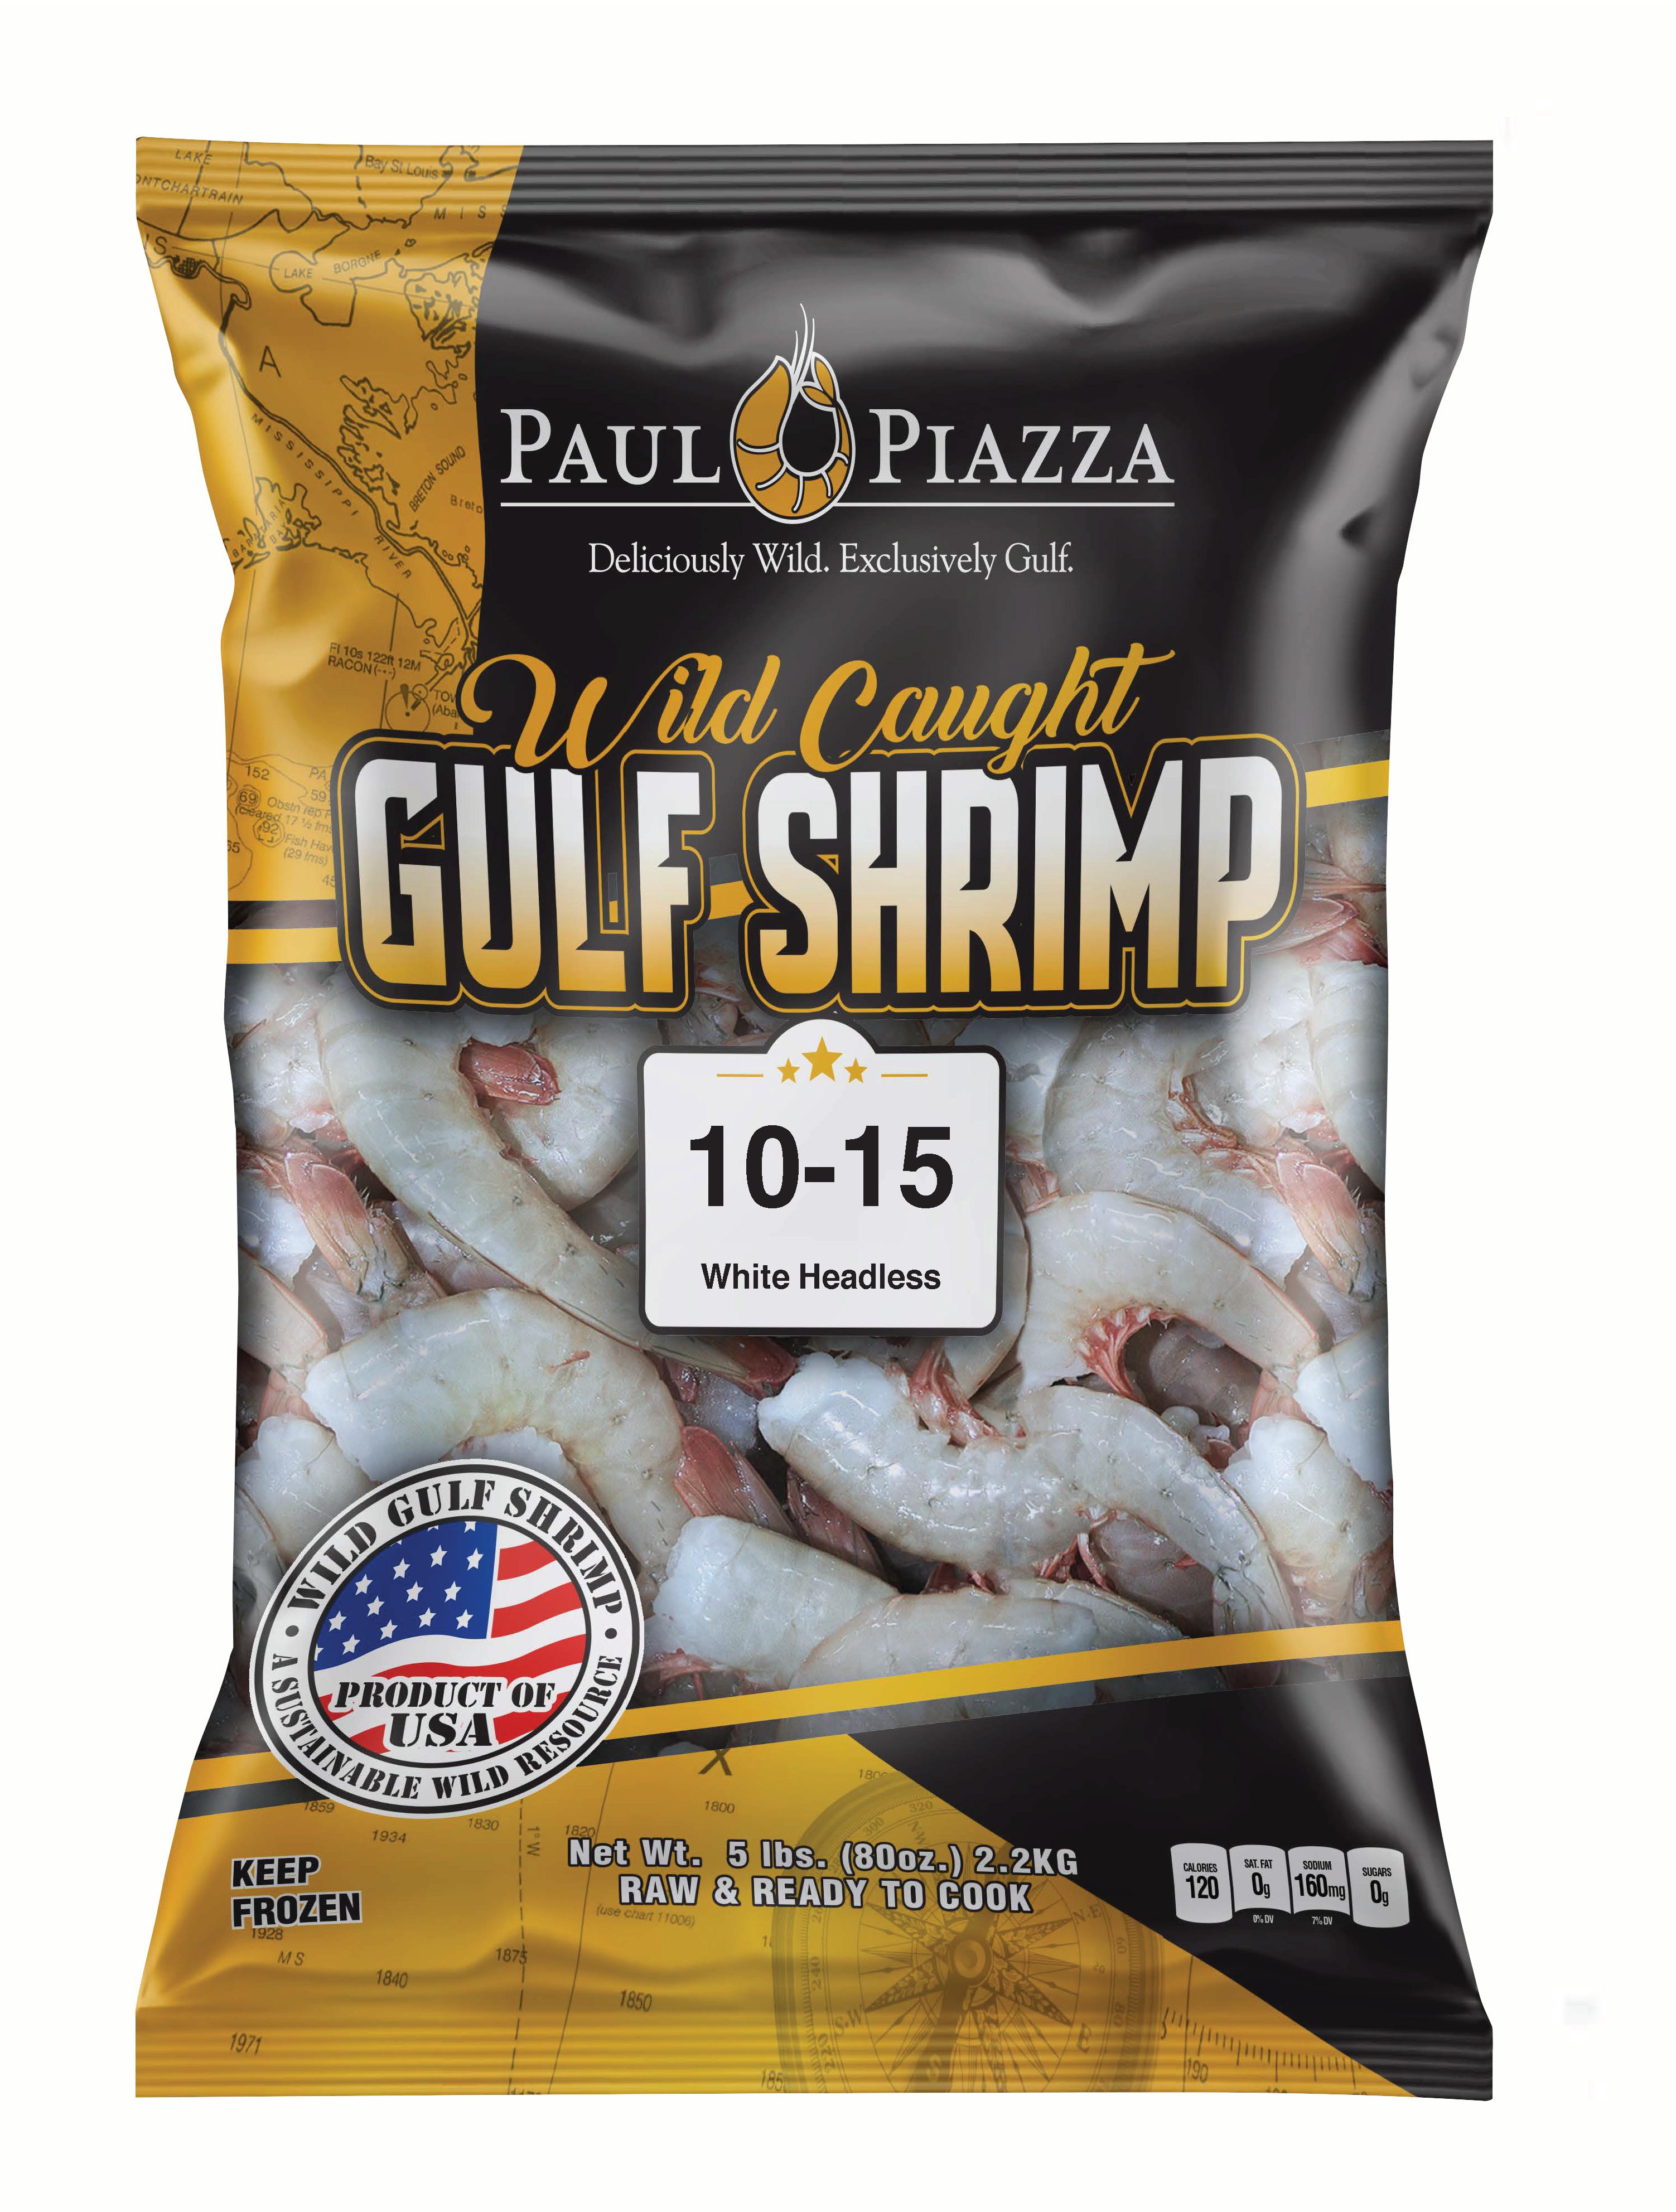 Wild Caught Gulf Shrimp Packaging